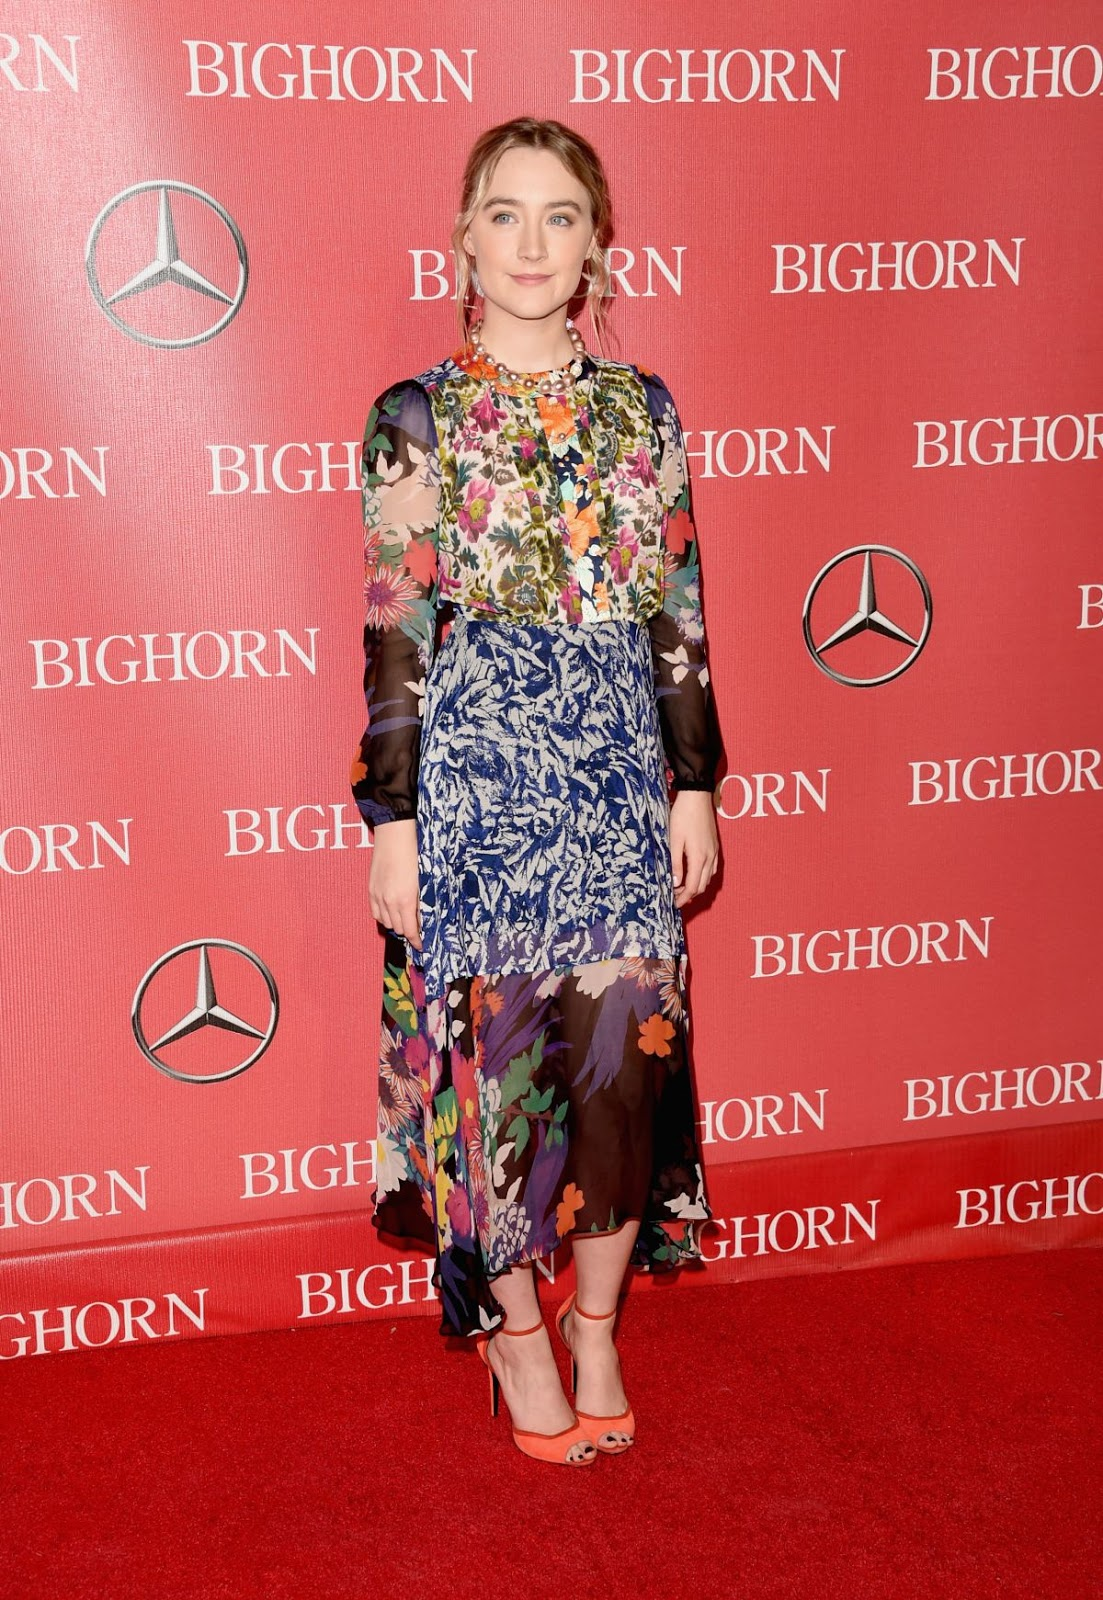 'Brooklyn's' Saoirse Ronan Tapped for Palm Springs Film Fest's International Star Award